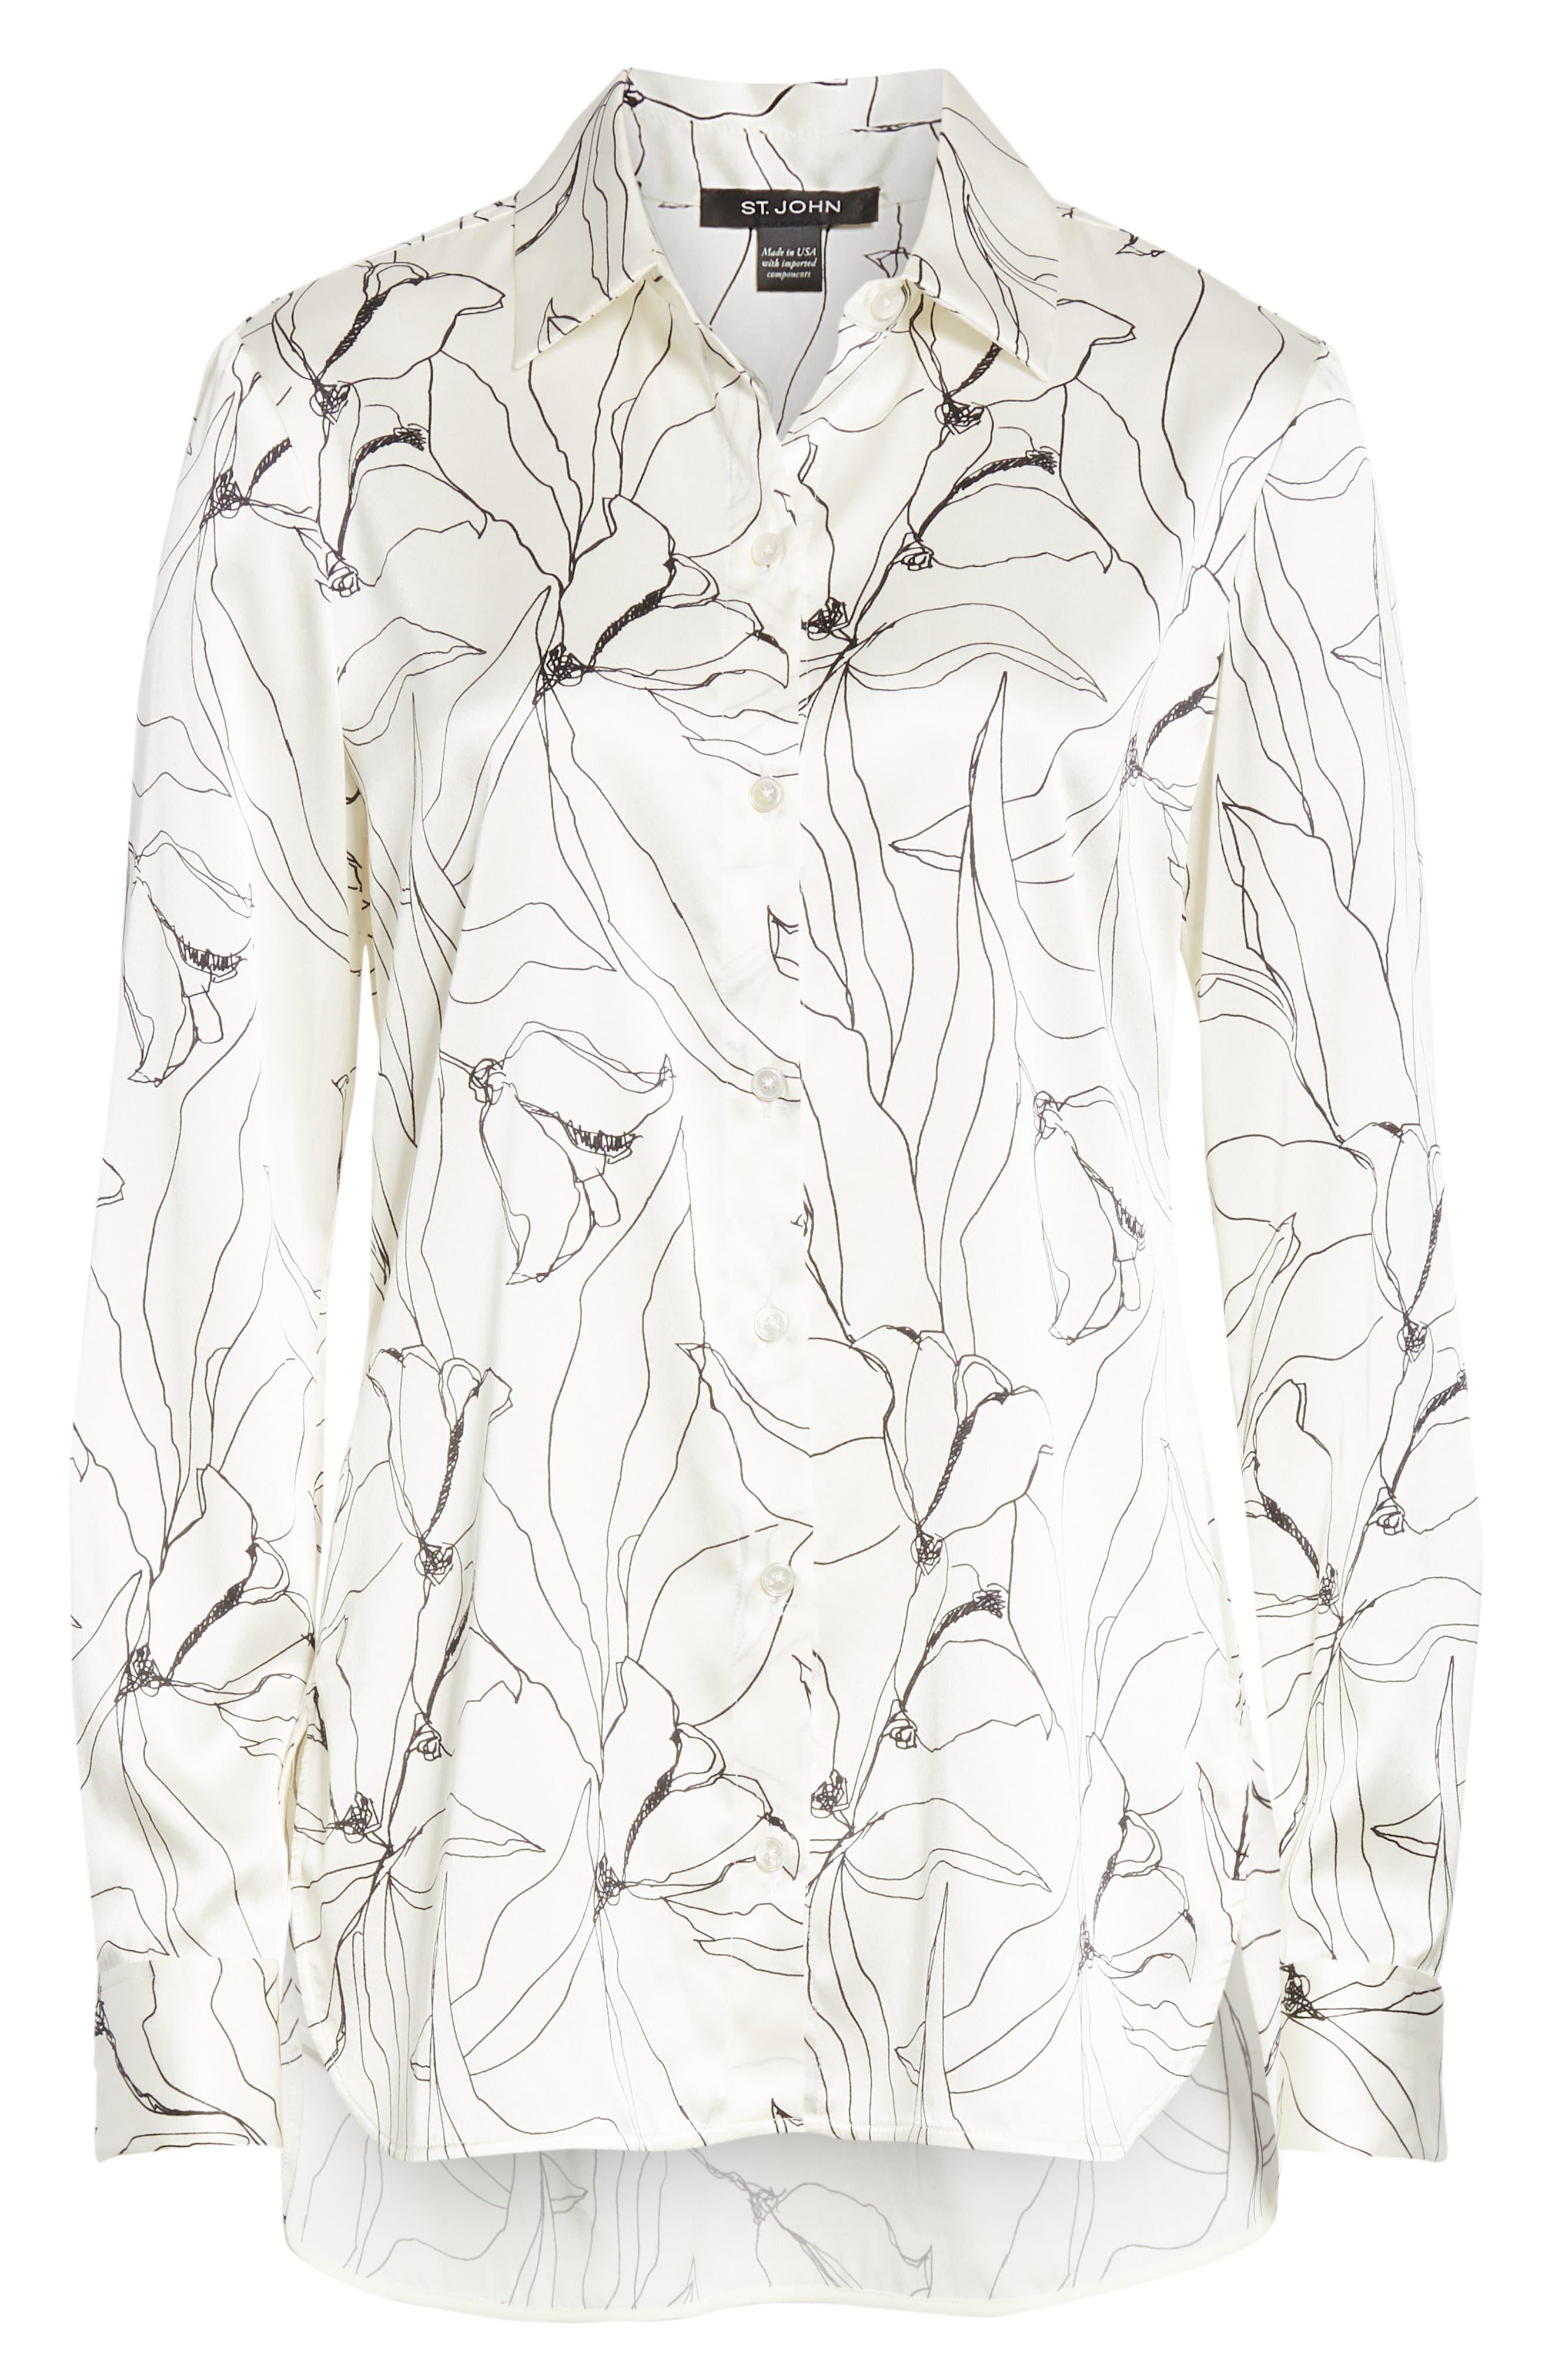 ST. JOHN COLLECTION,                             Artisanal Floral Stretch Silk Blouse,                             Alternate thumbnail 6, color,                             CREAM/ CAVIAR